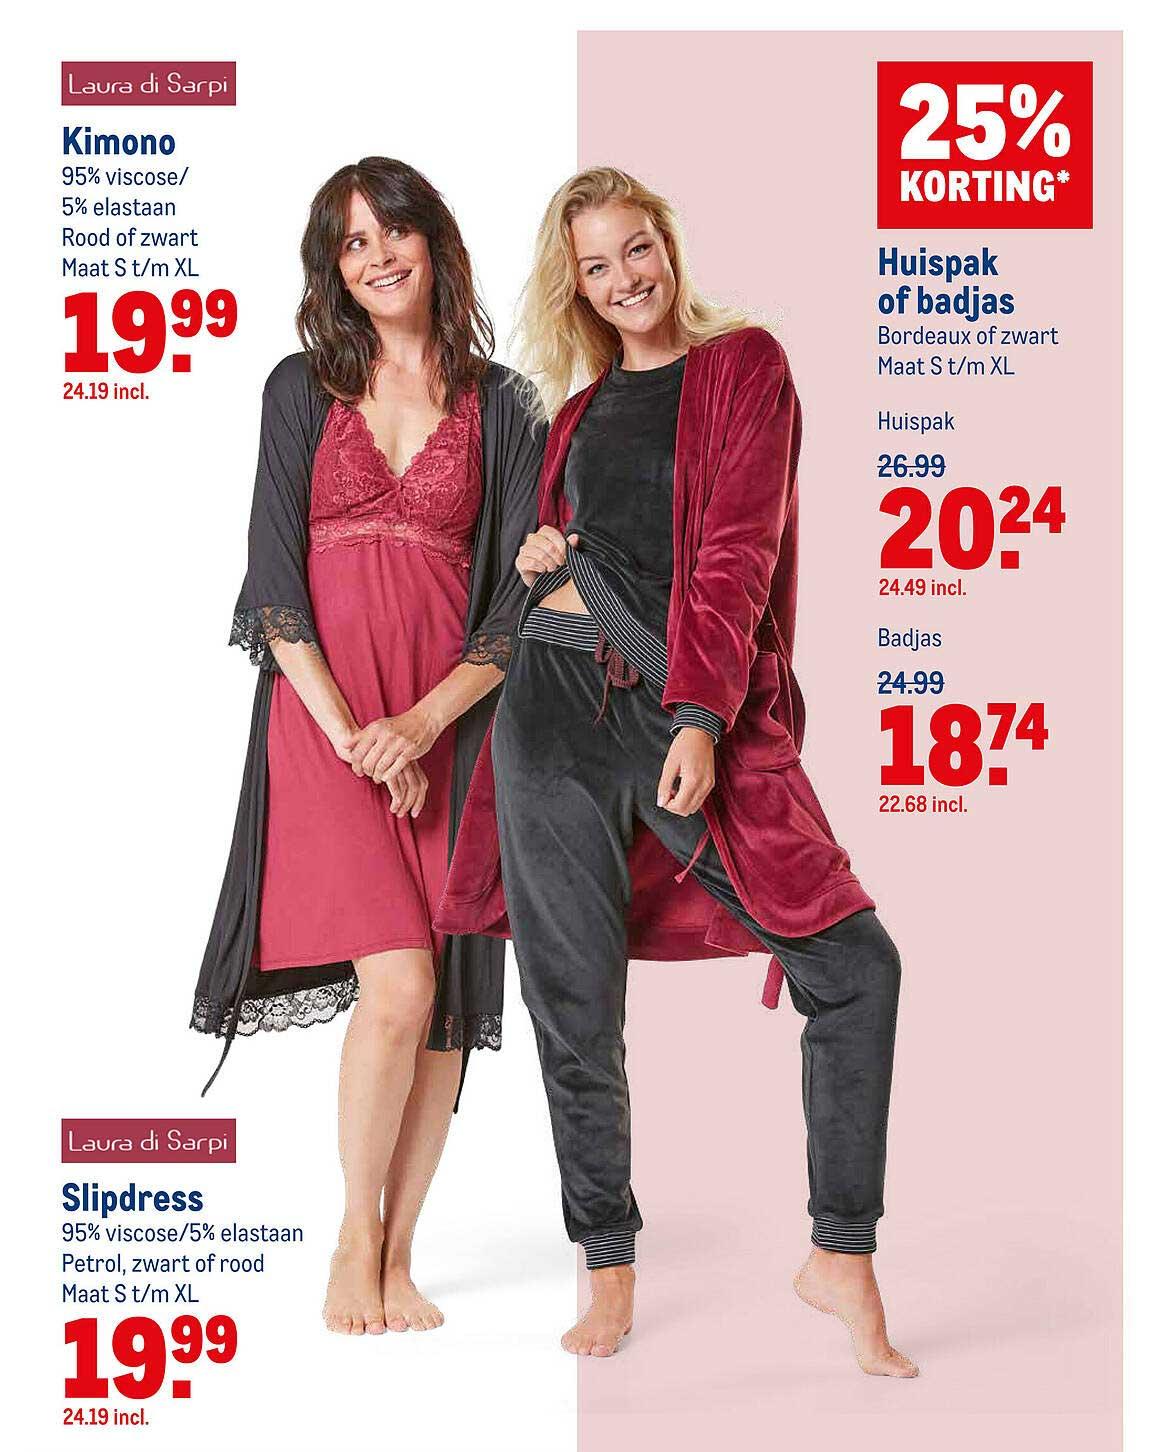 Makro Laura Di Sarpi Kimono Of Slipdress Of Huispak Of Badjas 25% Korting